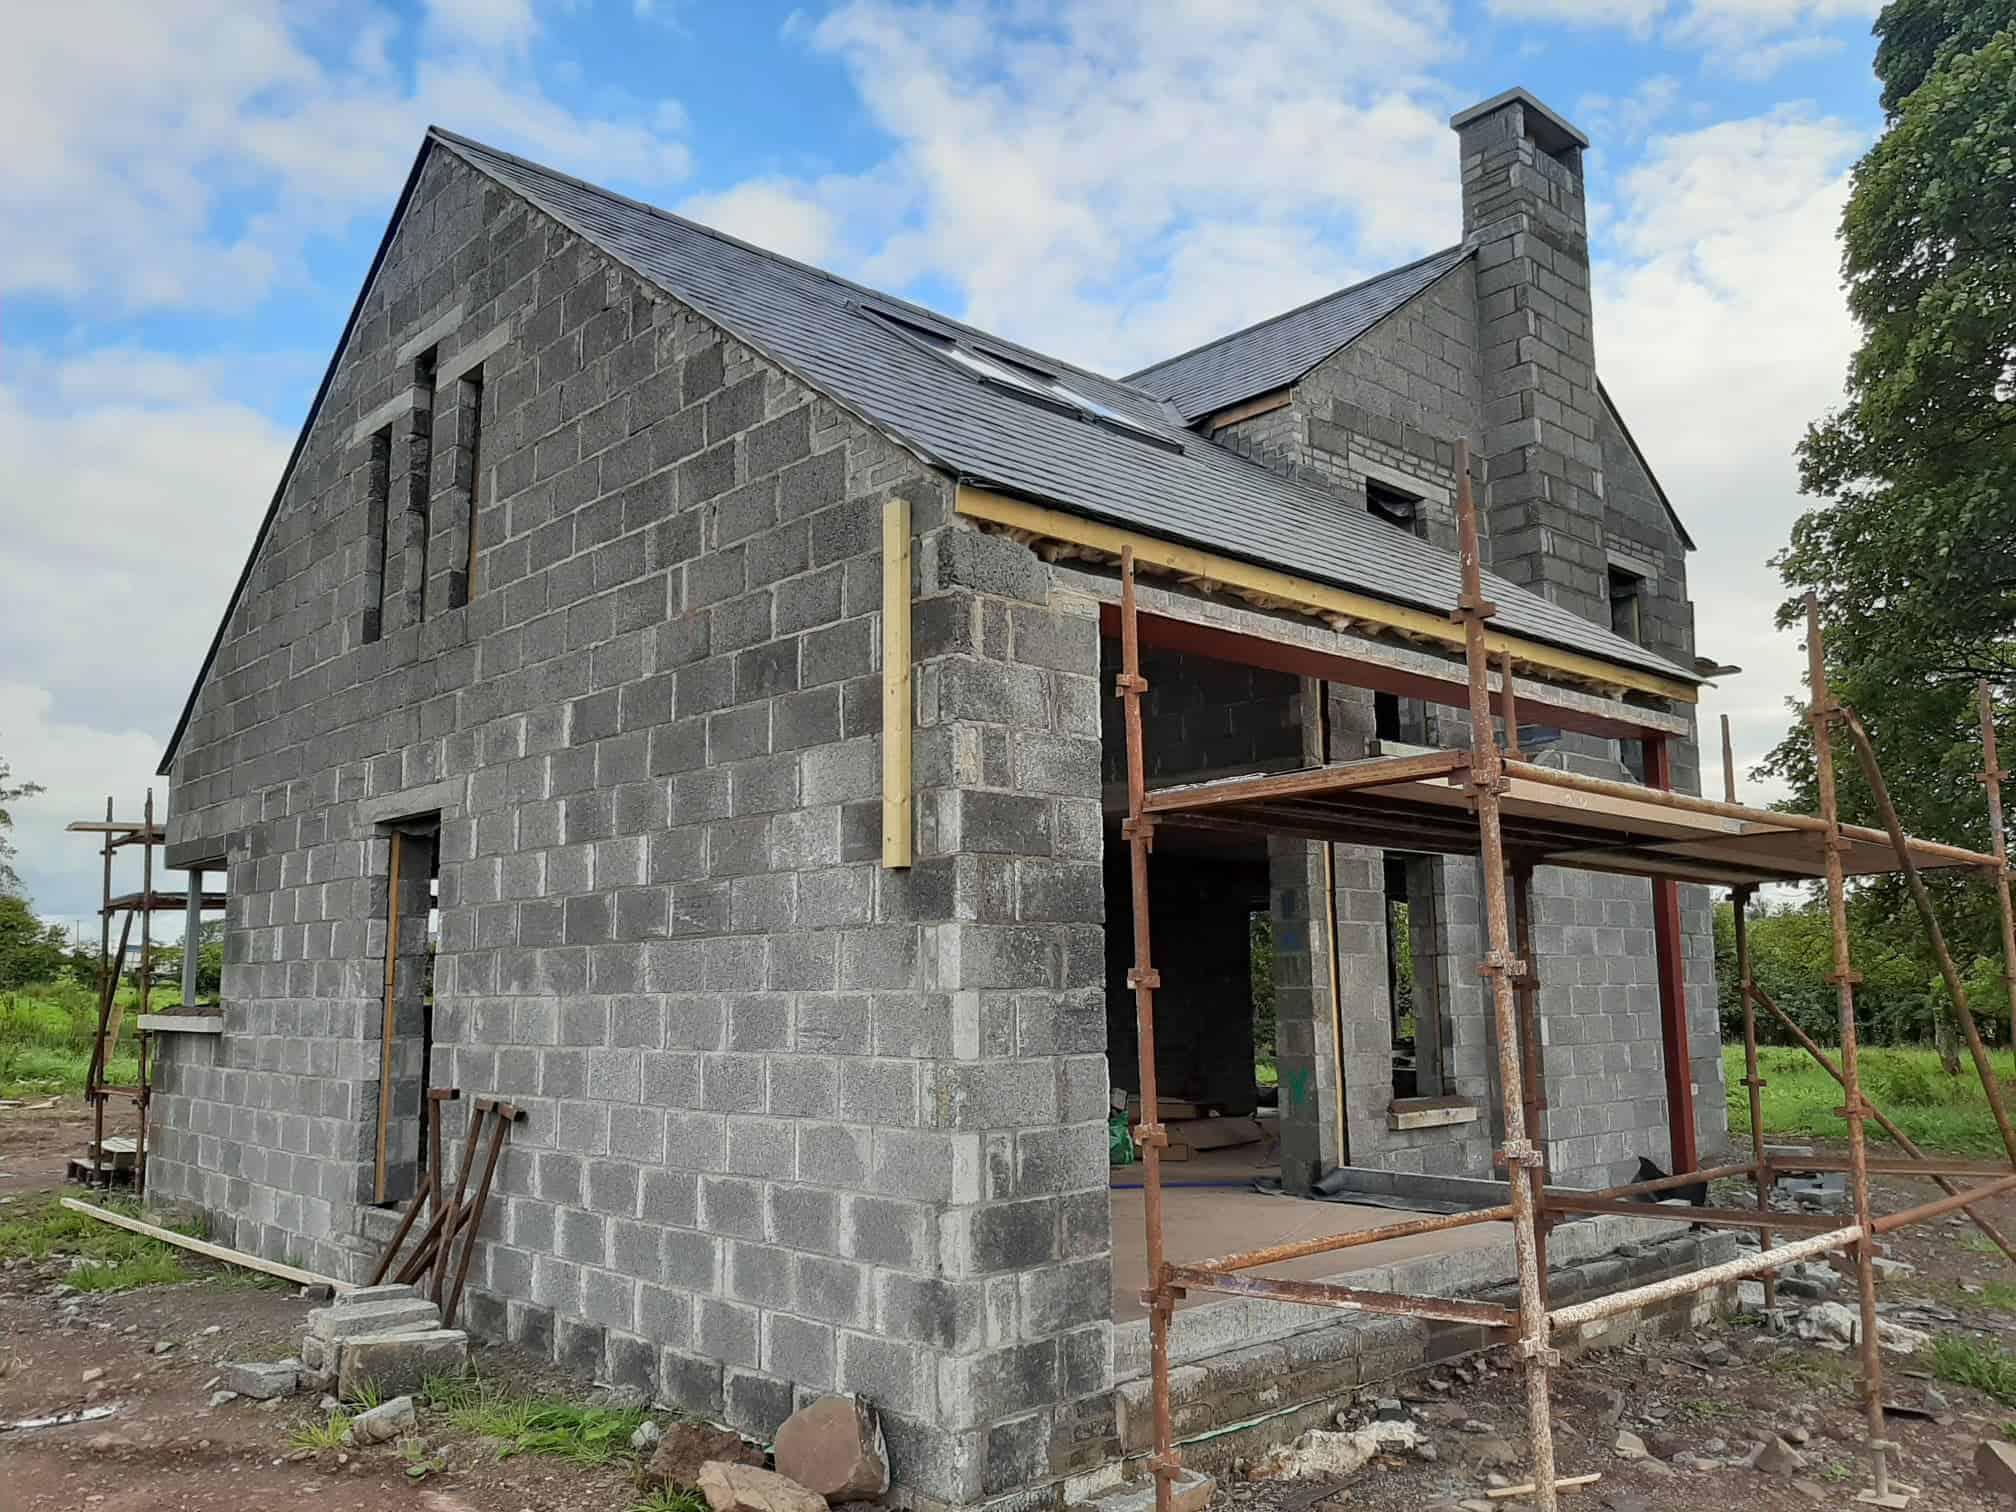 Beatty Dwelling - Under Construction